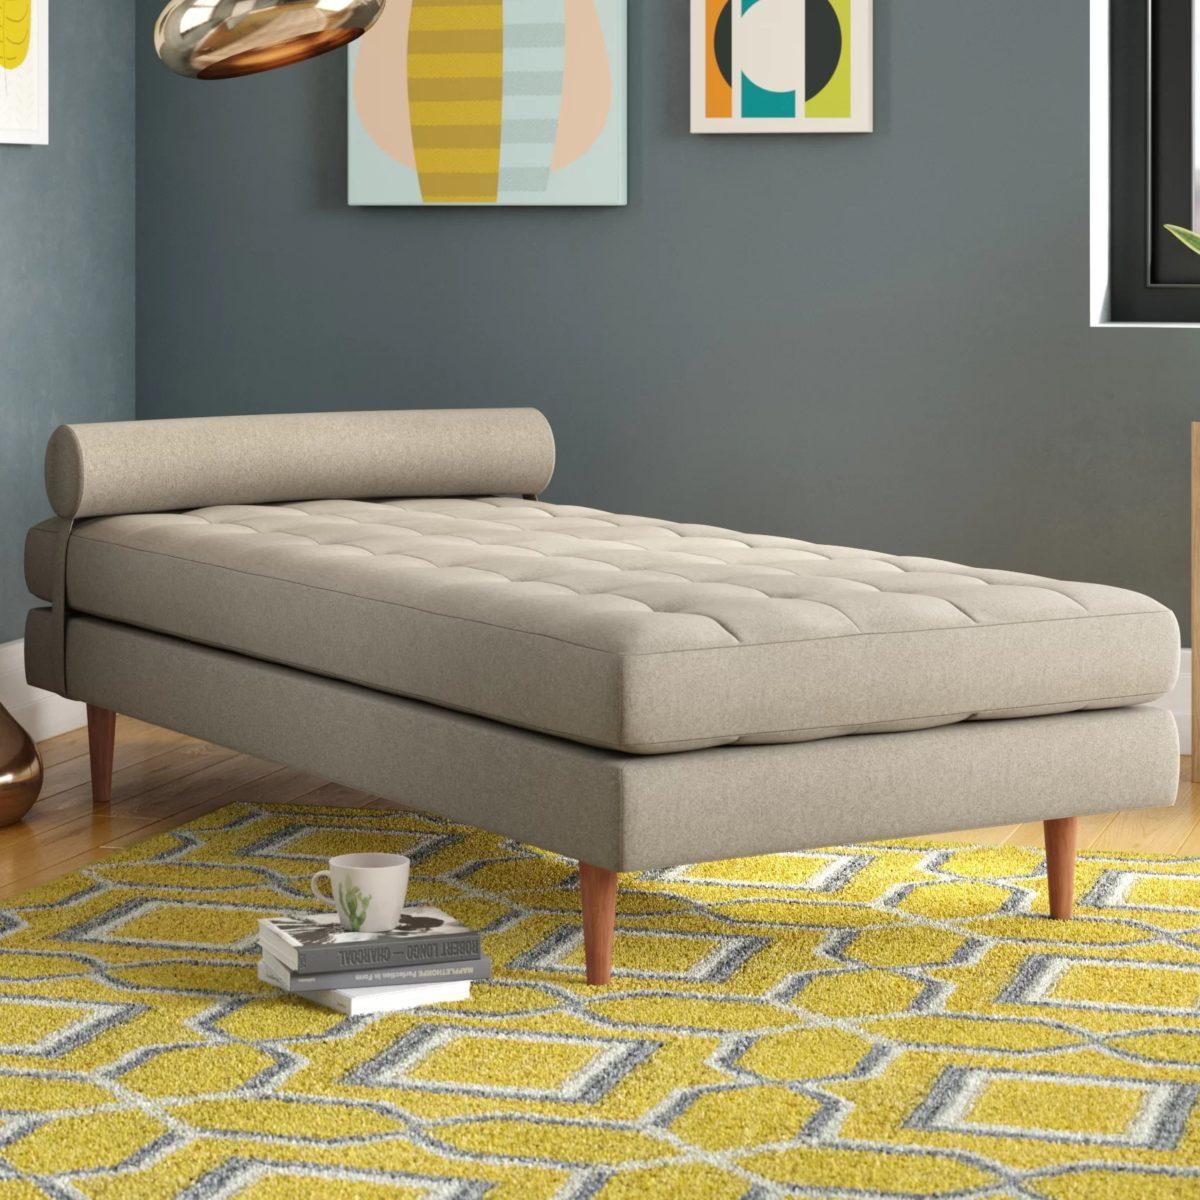 chaise-lounge-scandinava